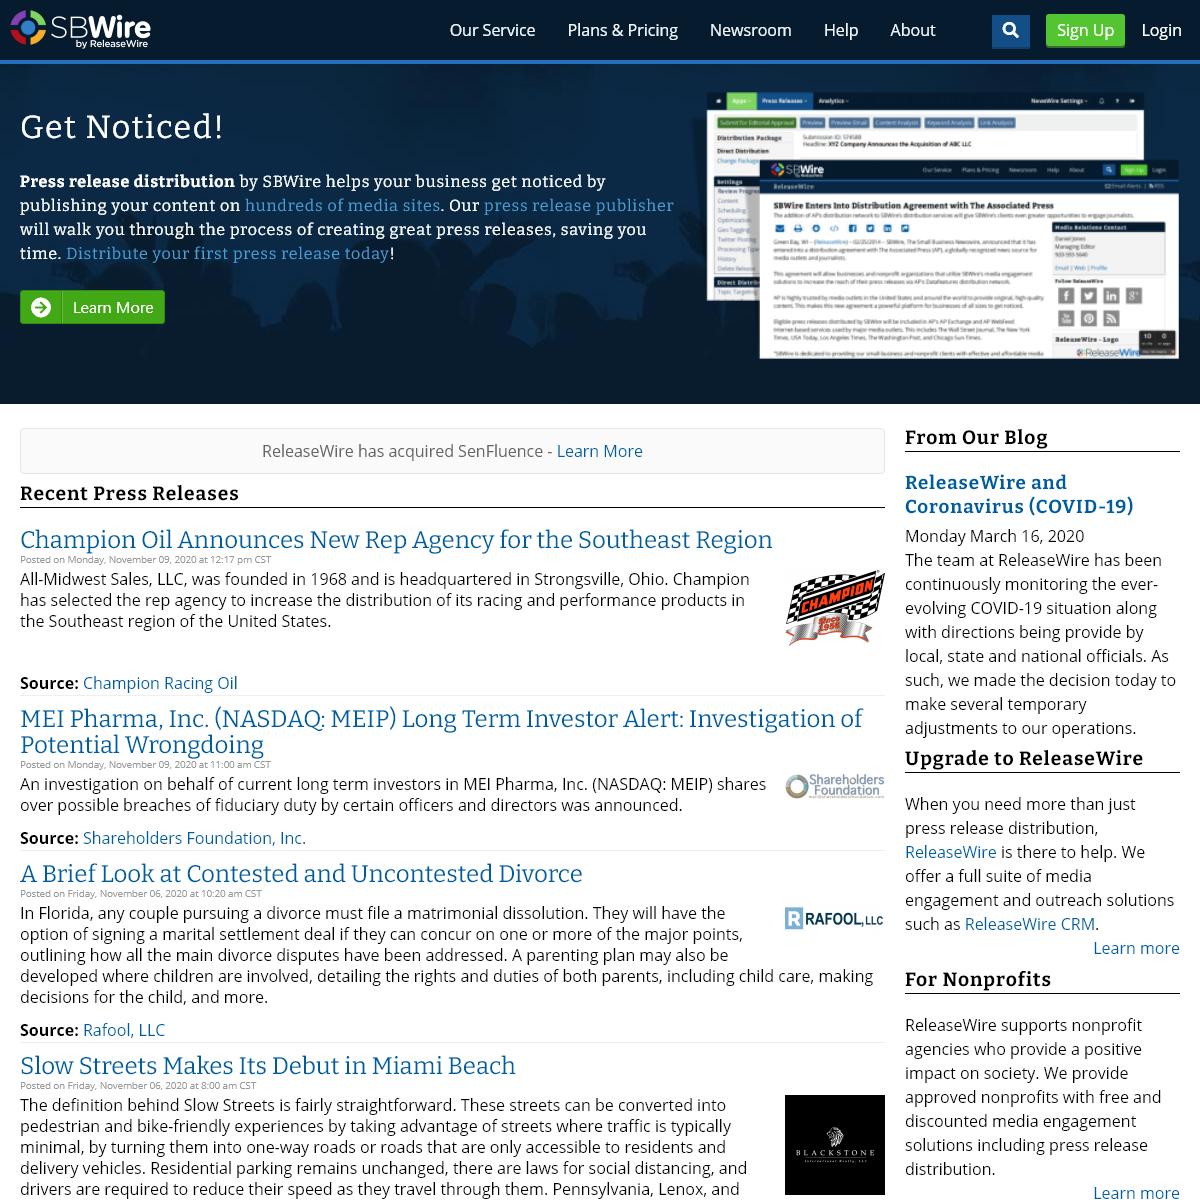 SBWire - The Small Business Newswire